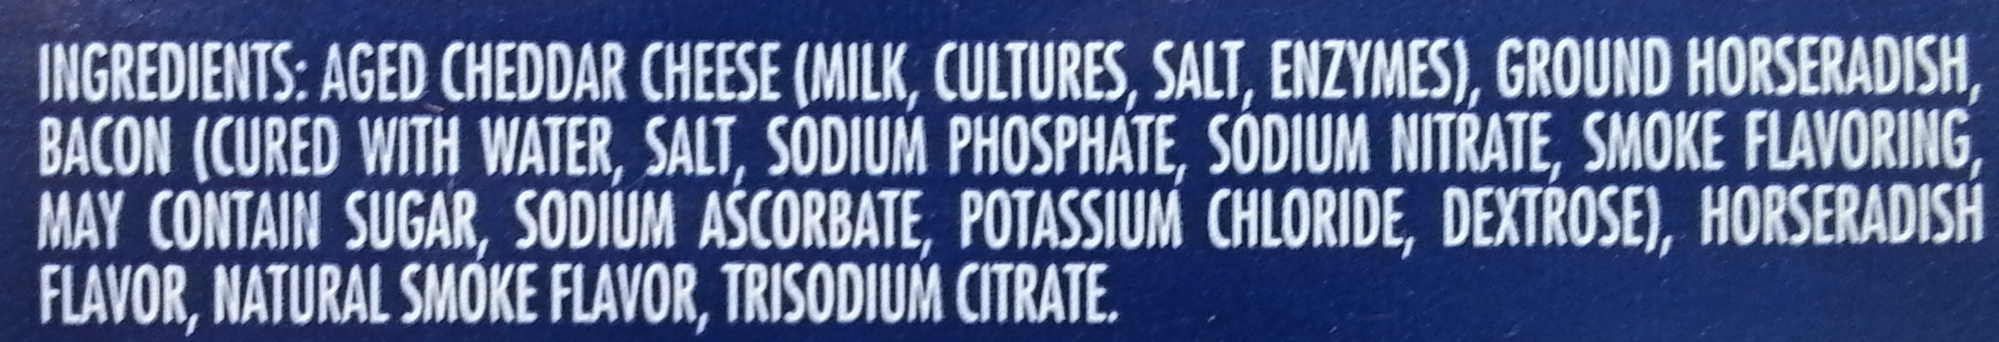 Bacon & Horseradish Cheddar Cheese - Ingredients